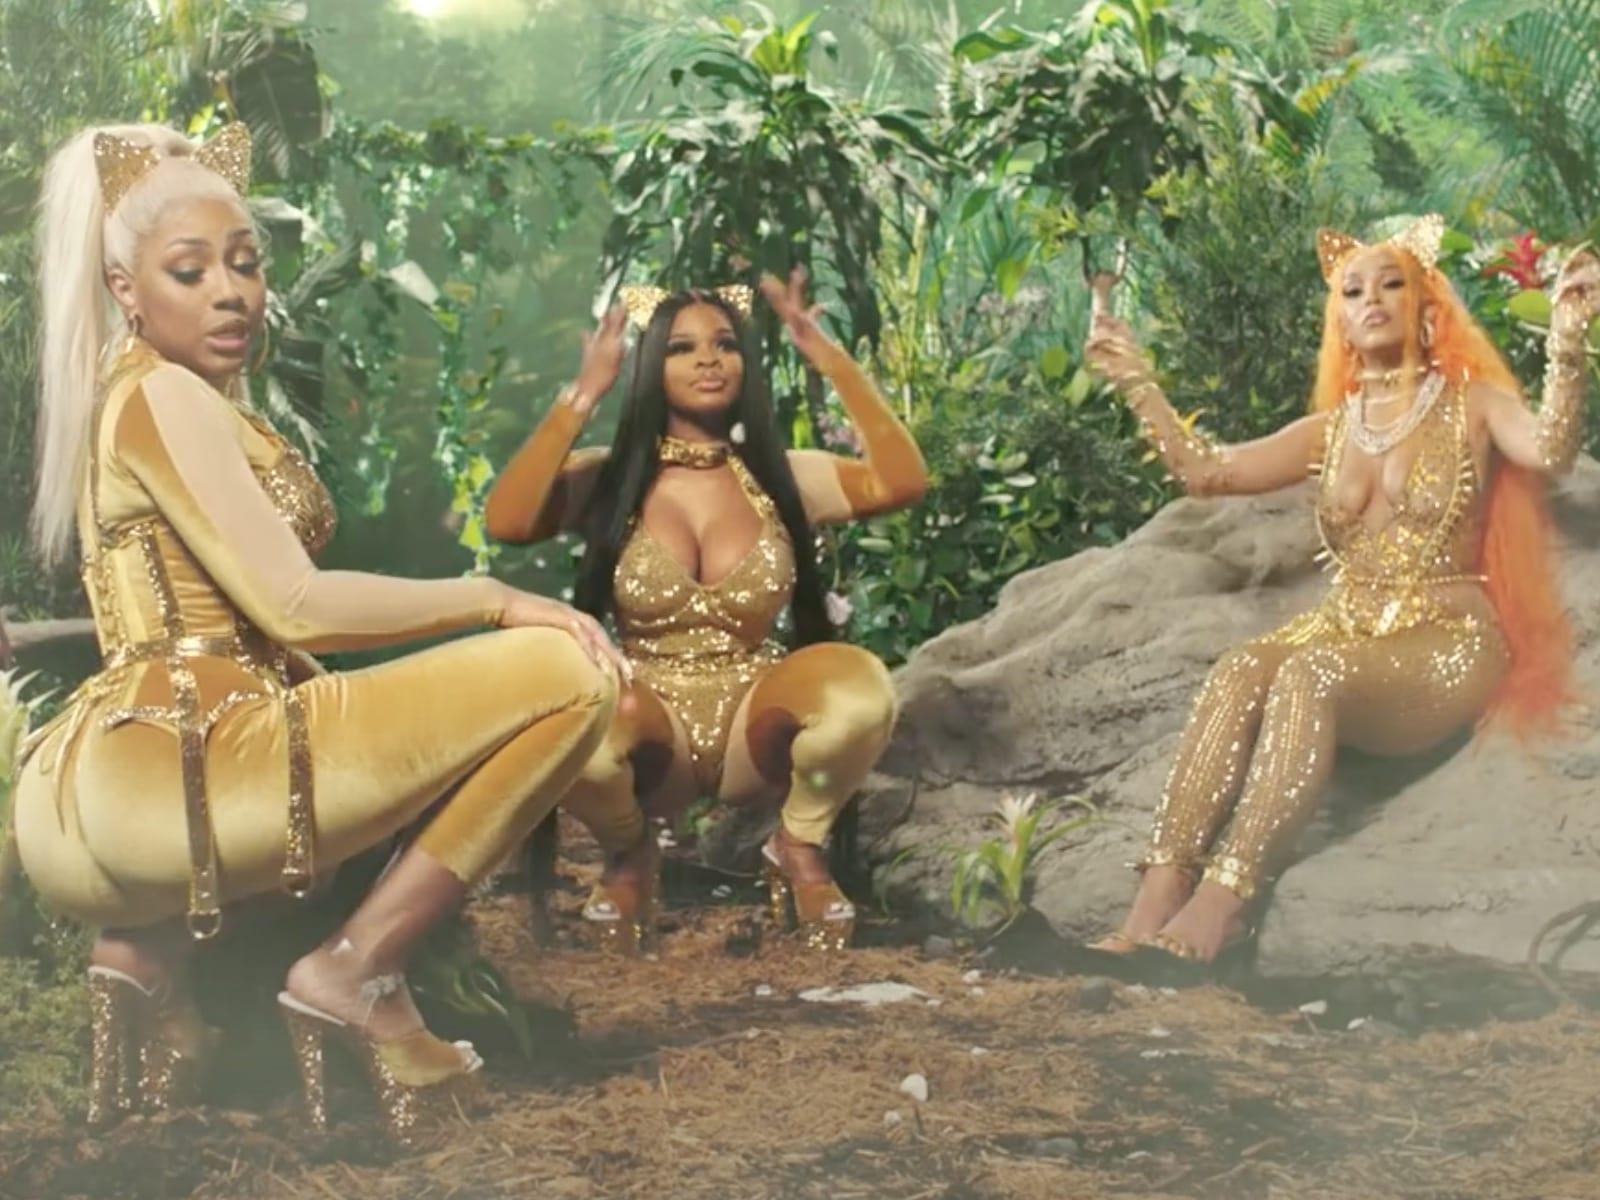 Yung Miami: 5 Friendship Goals Pics Nicki Minaj Can't Ignore  SOHH.com